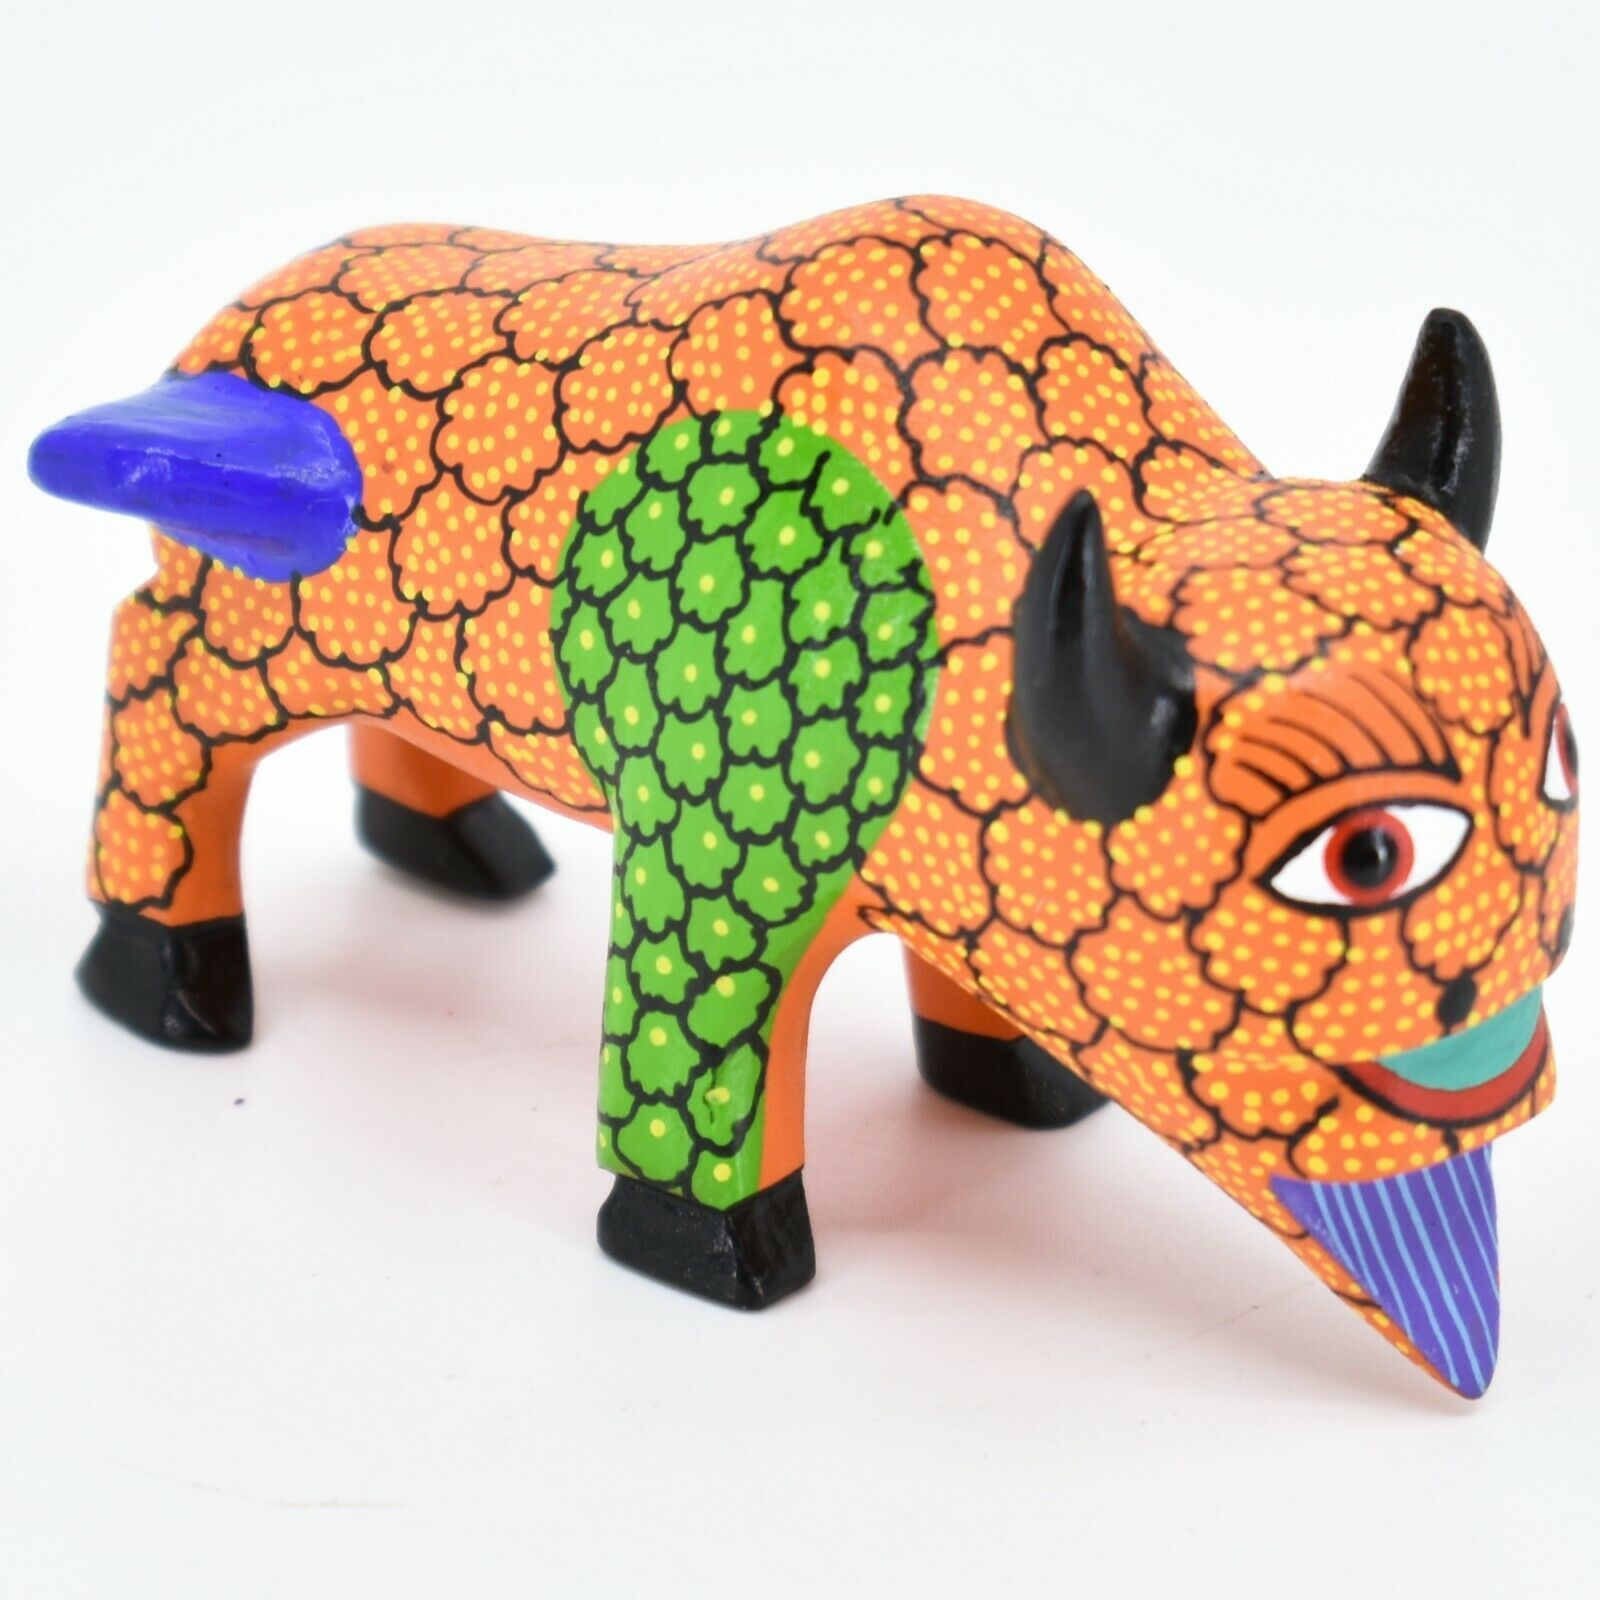 Handmade Alebrijes Oaxacan Wood Carved Painted Folk Art Buffalo Figurine